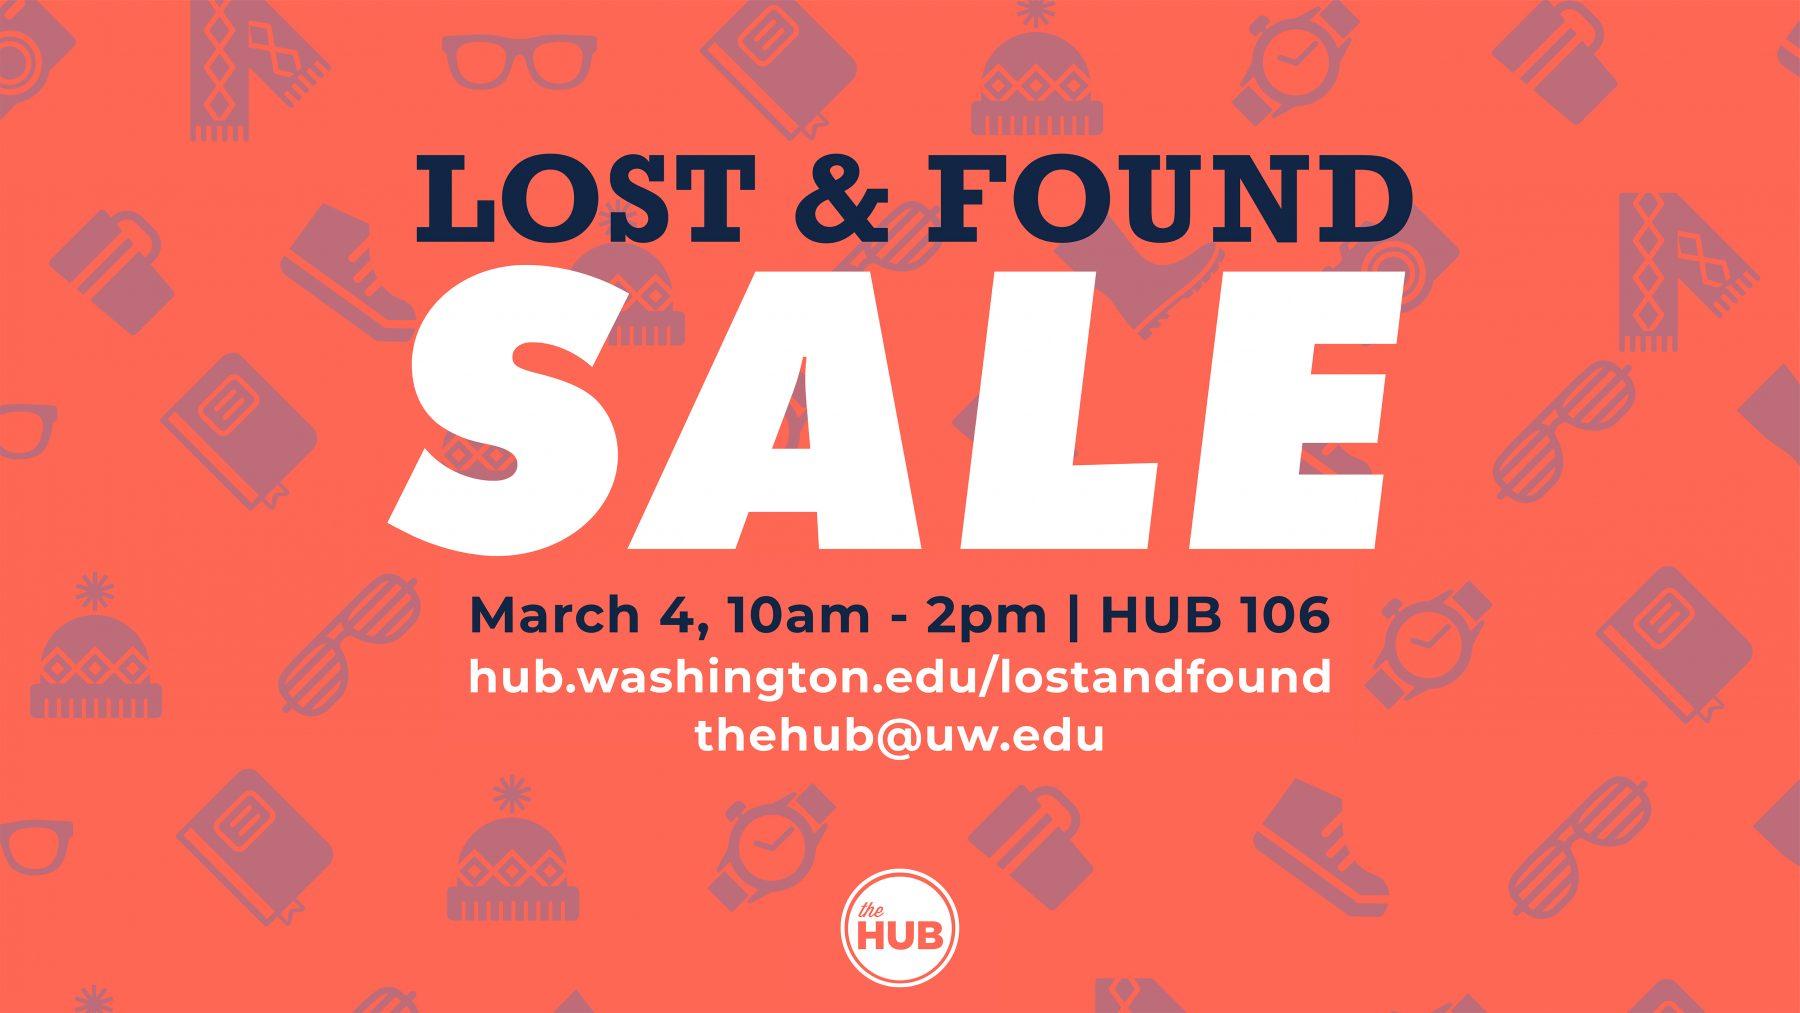 Lost & Found Sale Digital Display